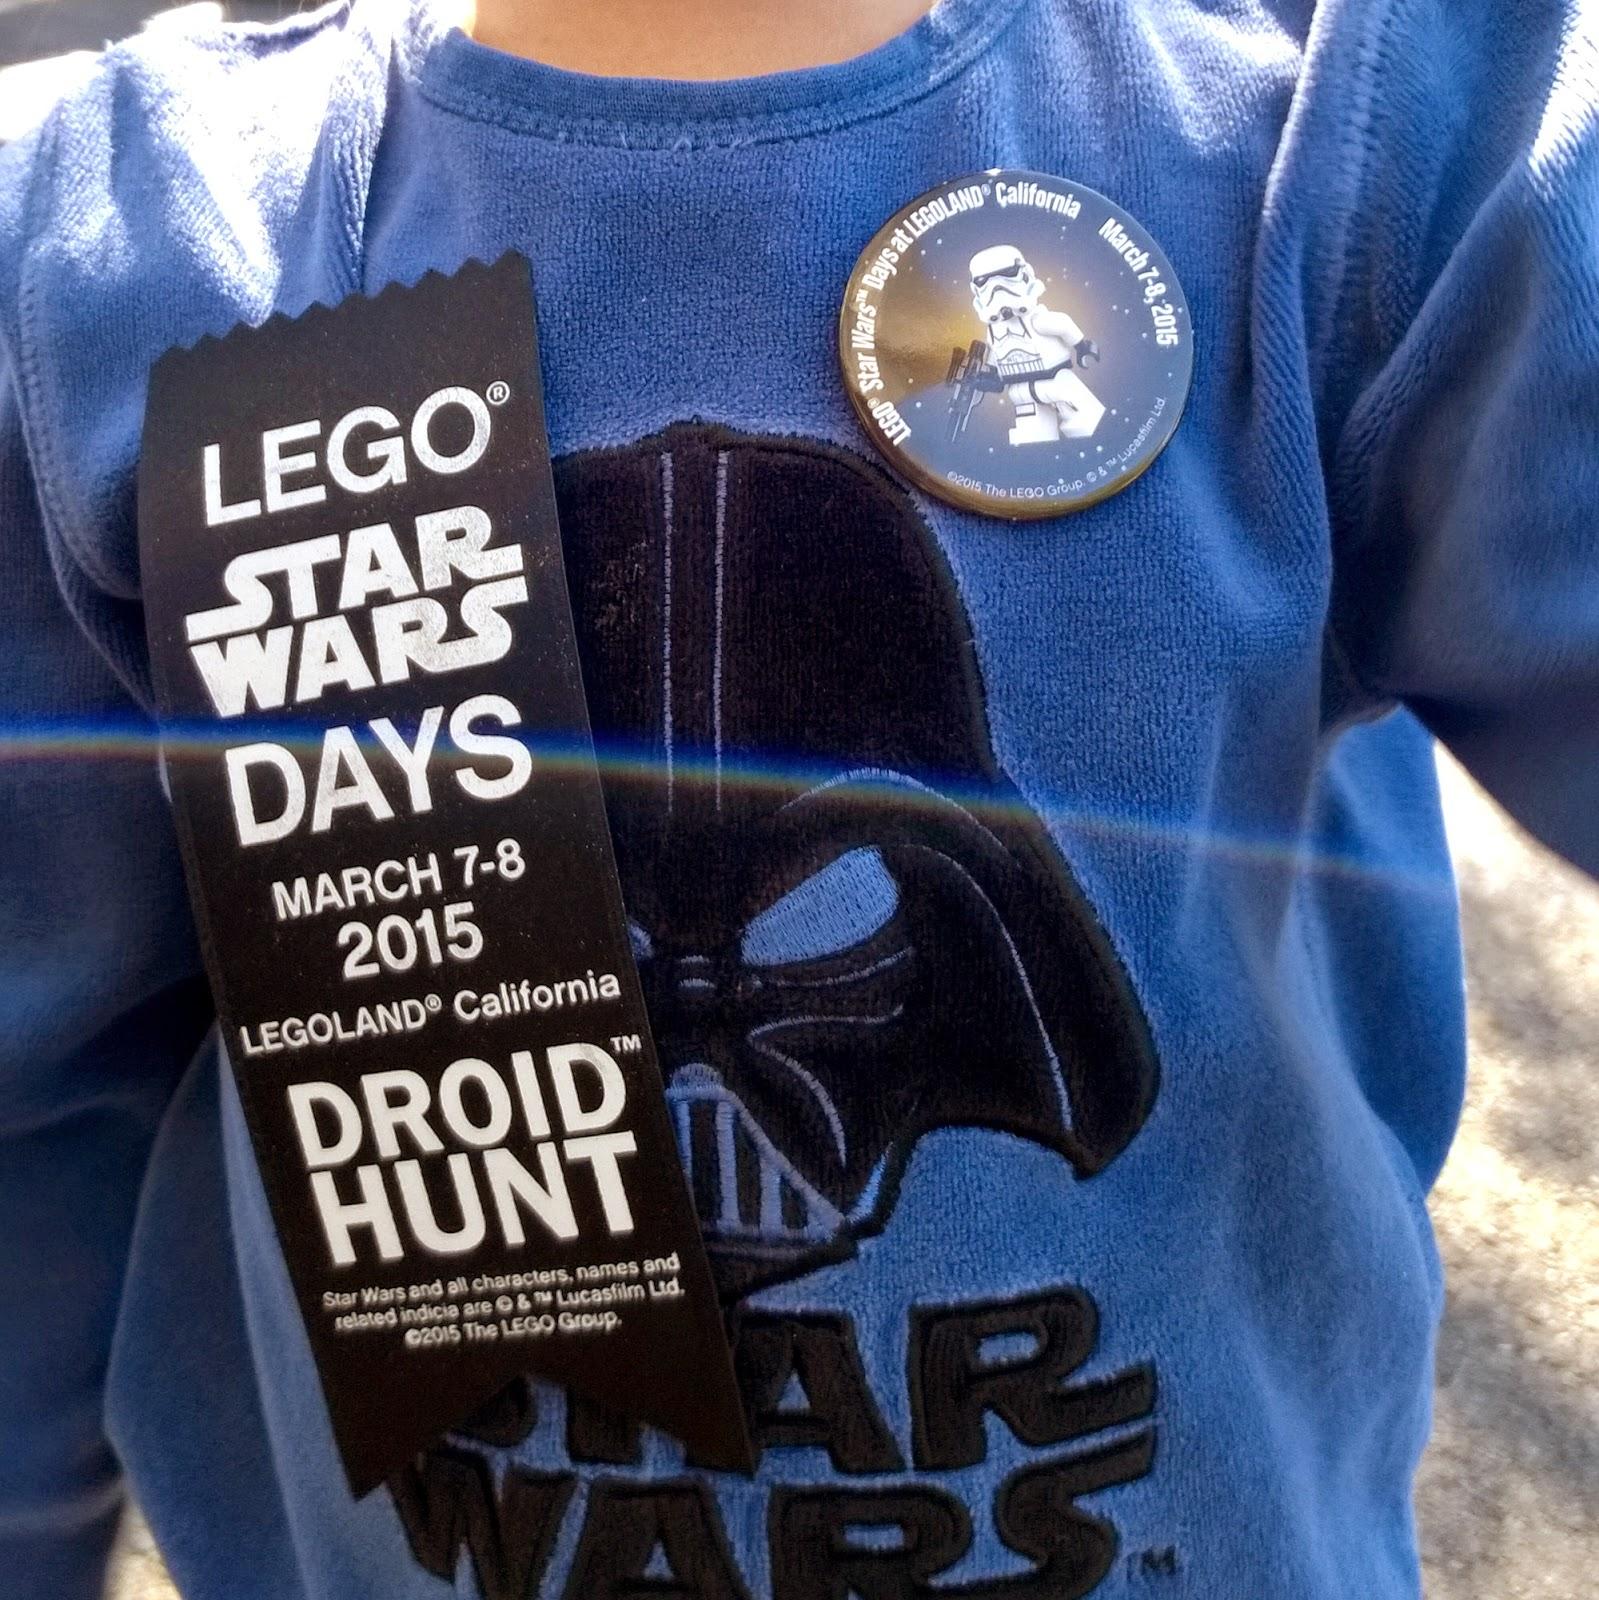 Legoland California Star Wars Days 2015